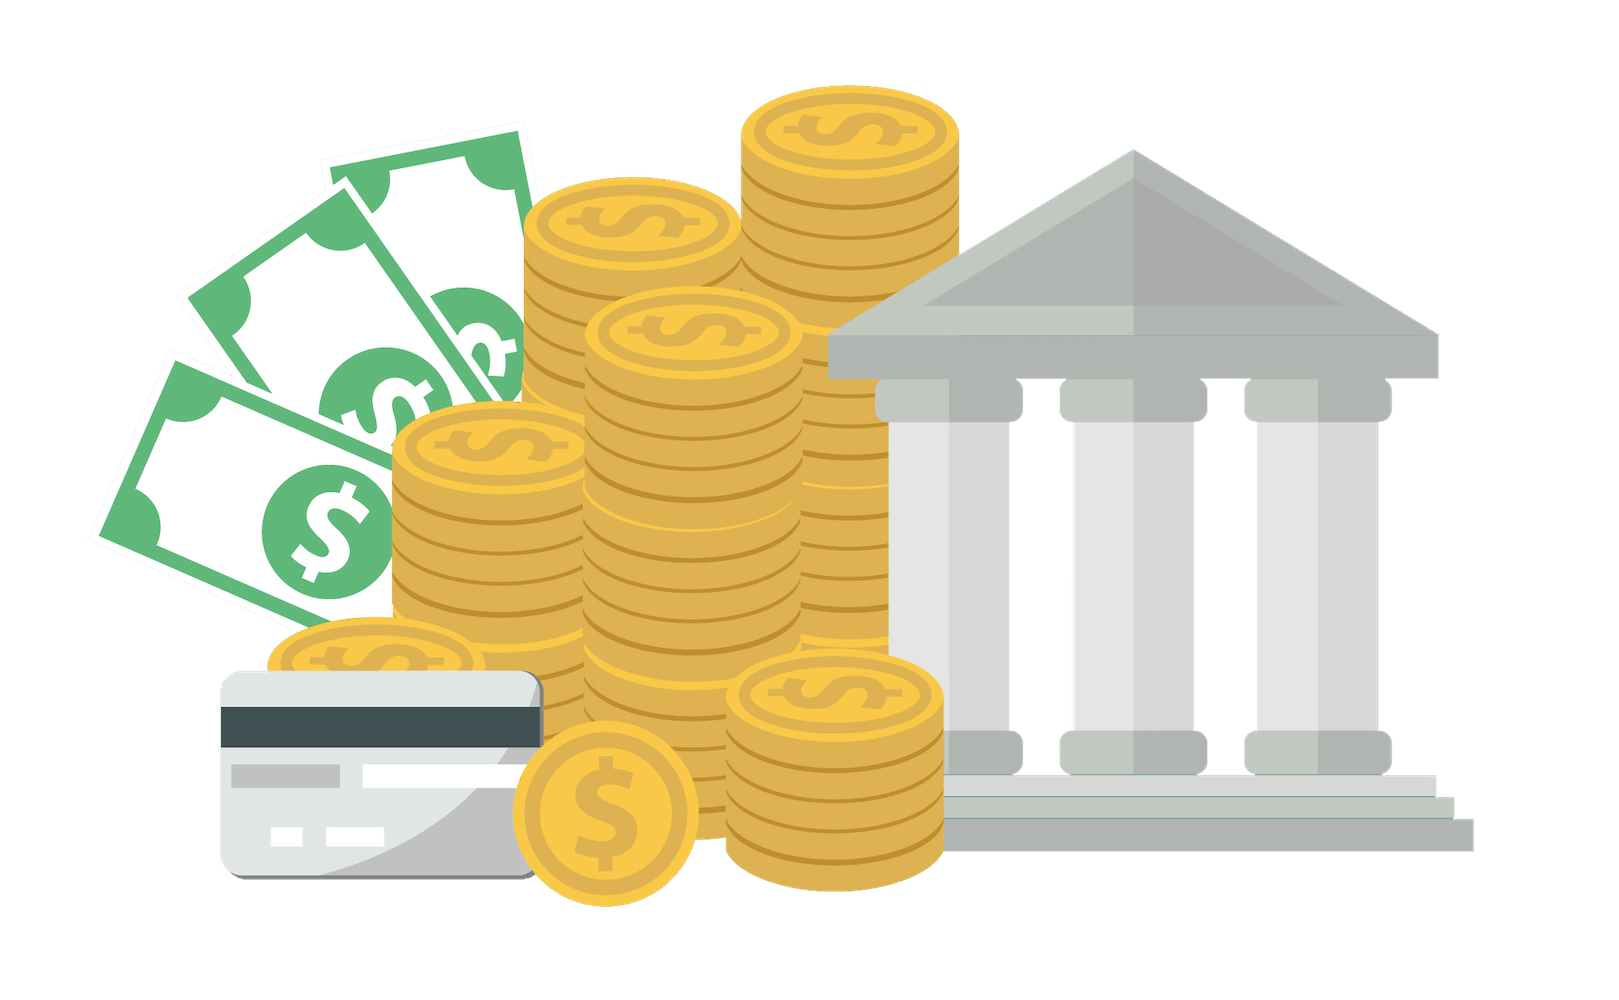 valuta bank